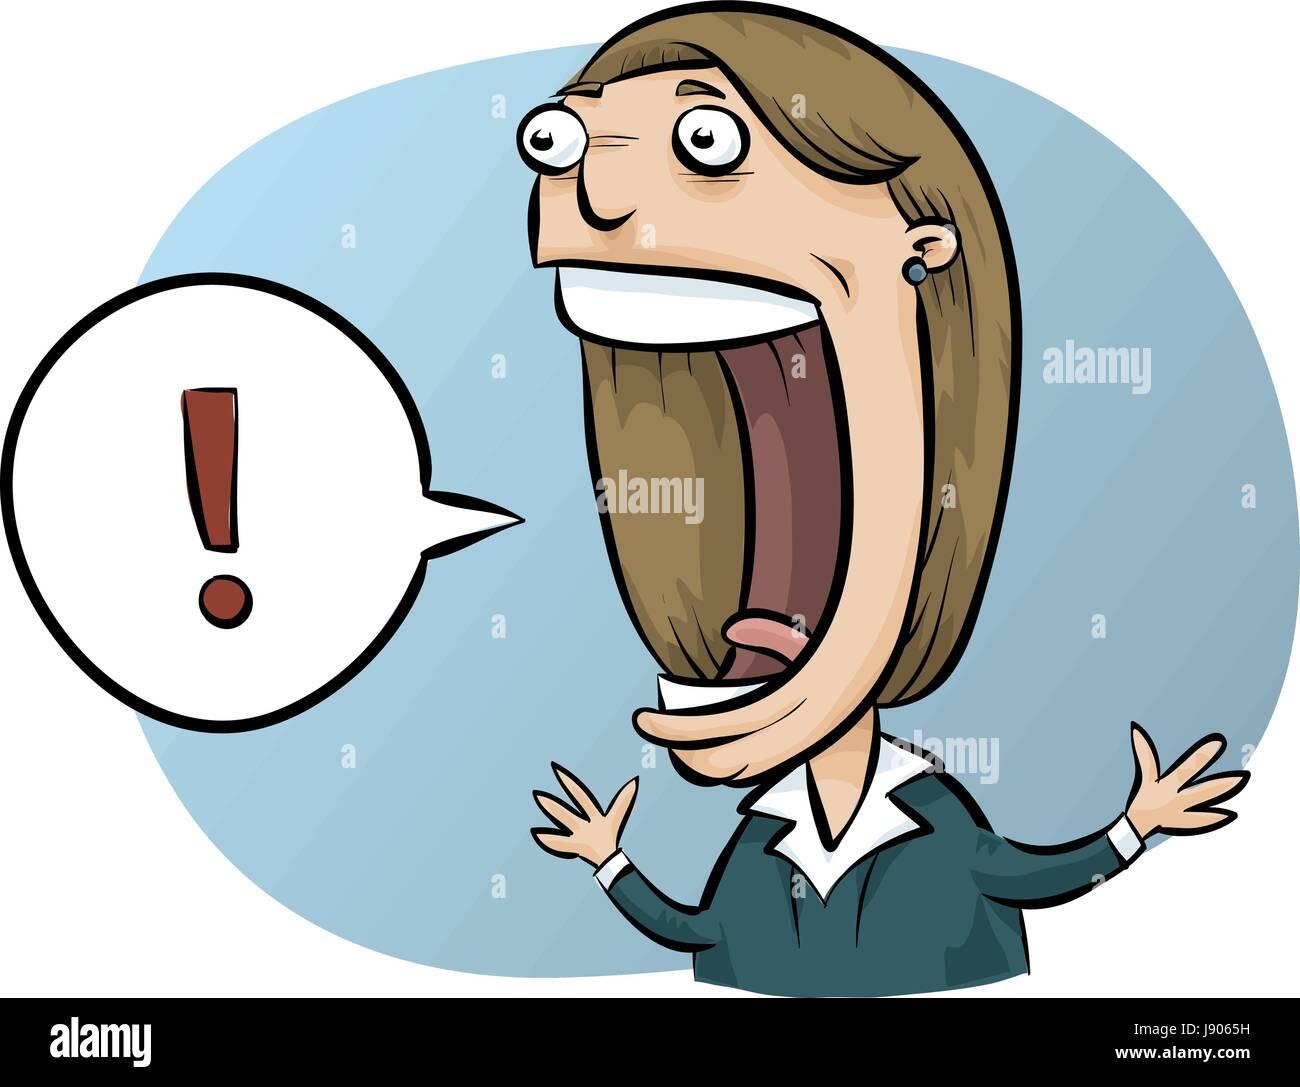 A cartoon businesswoman expresses excitement. - Stock Vector